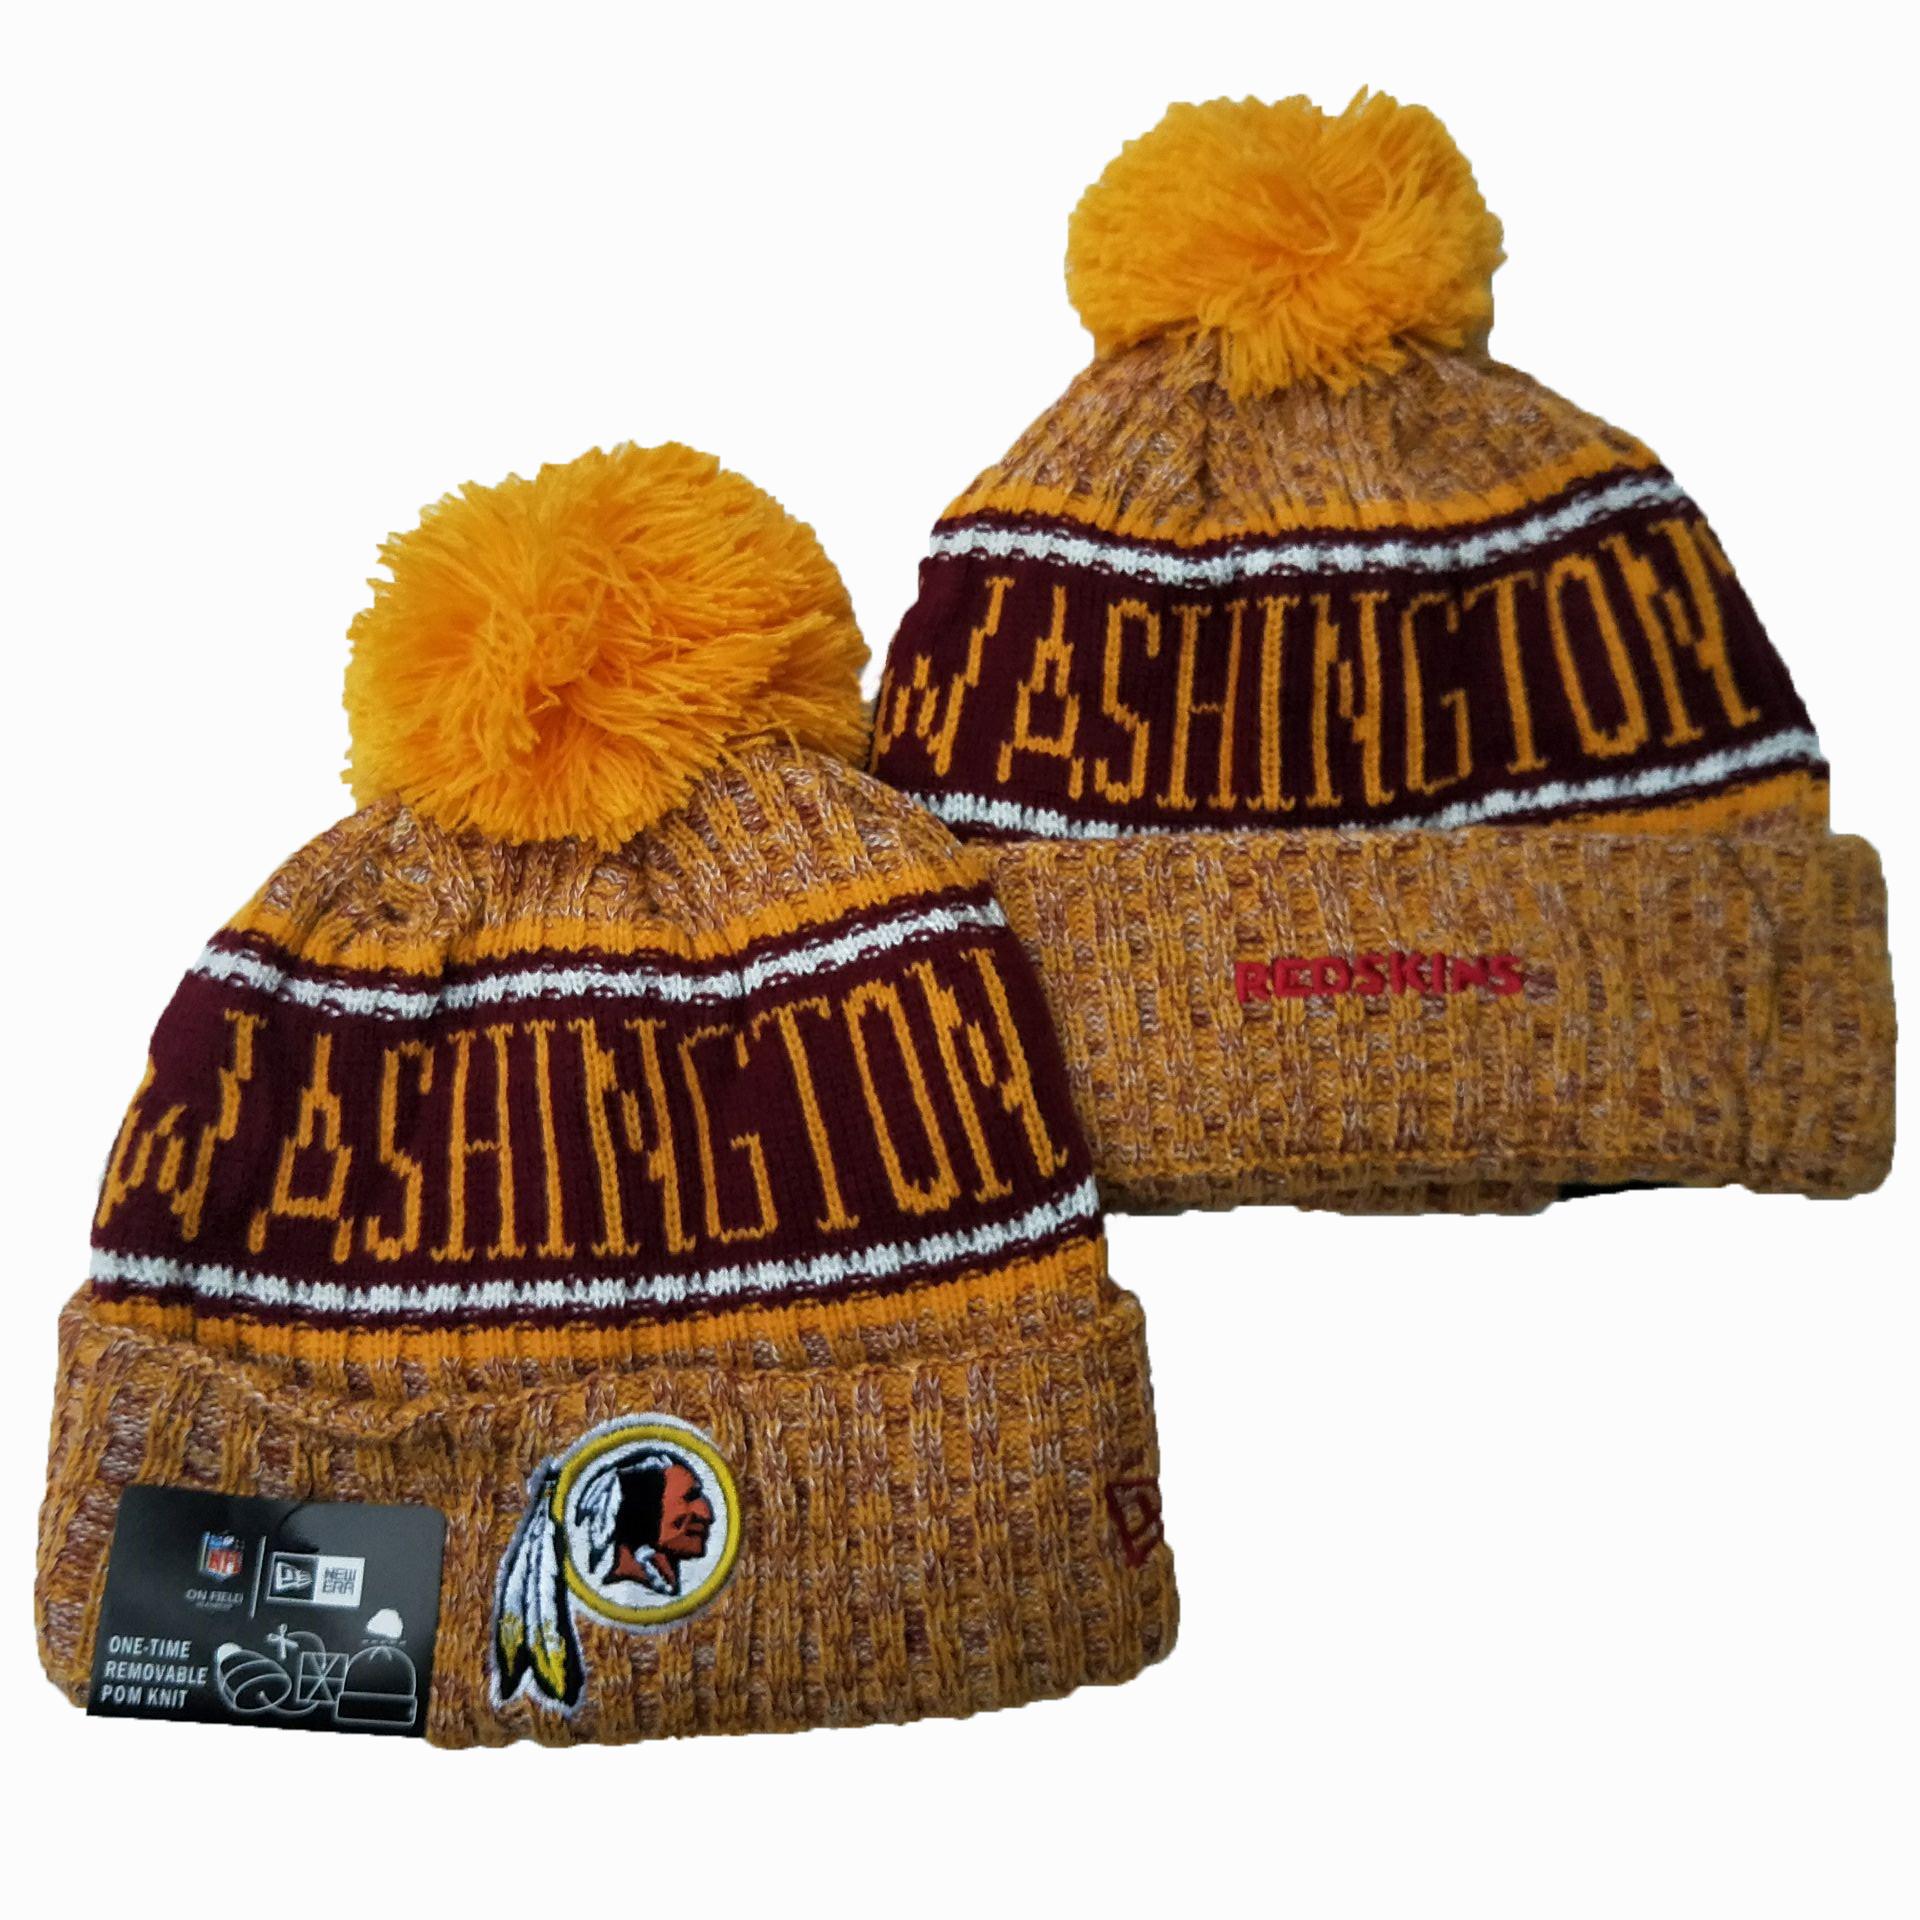 Redskins Team Logo Yellow Pom Knit Hat YD